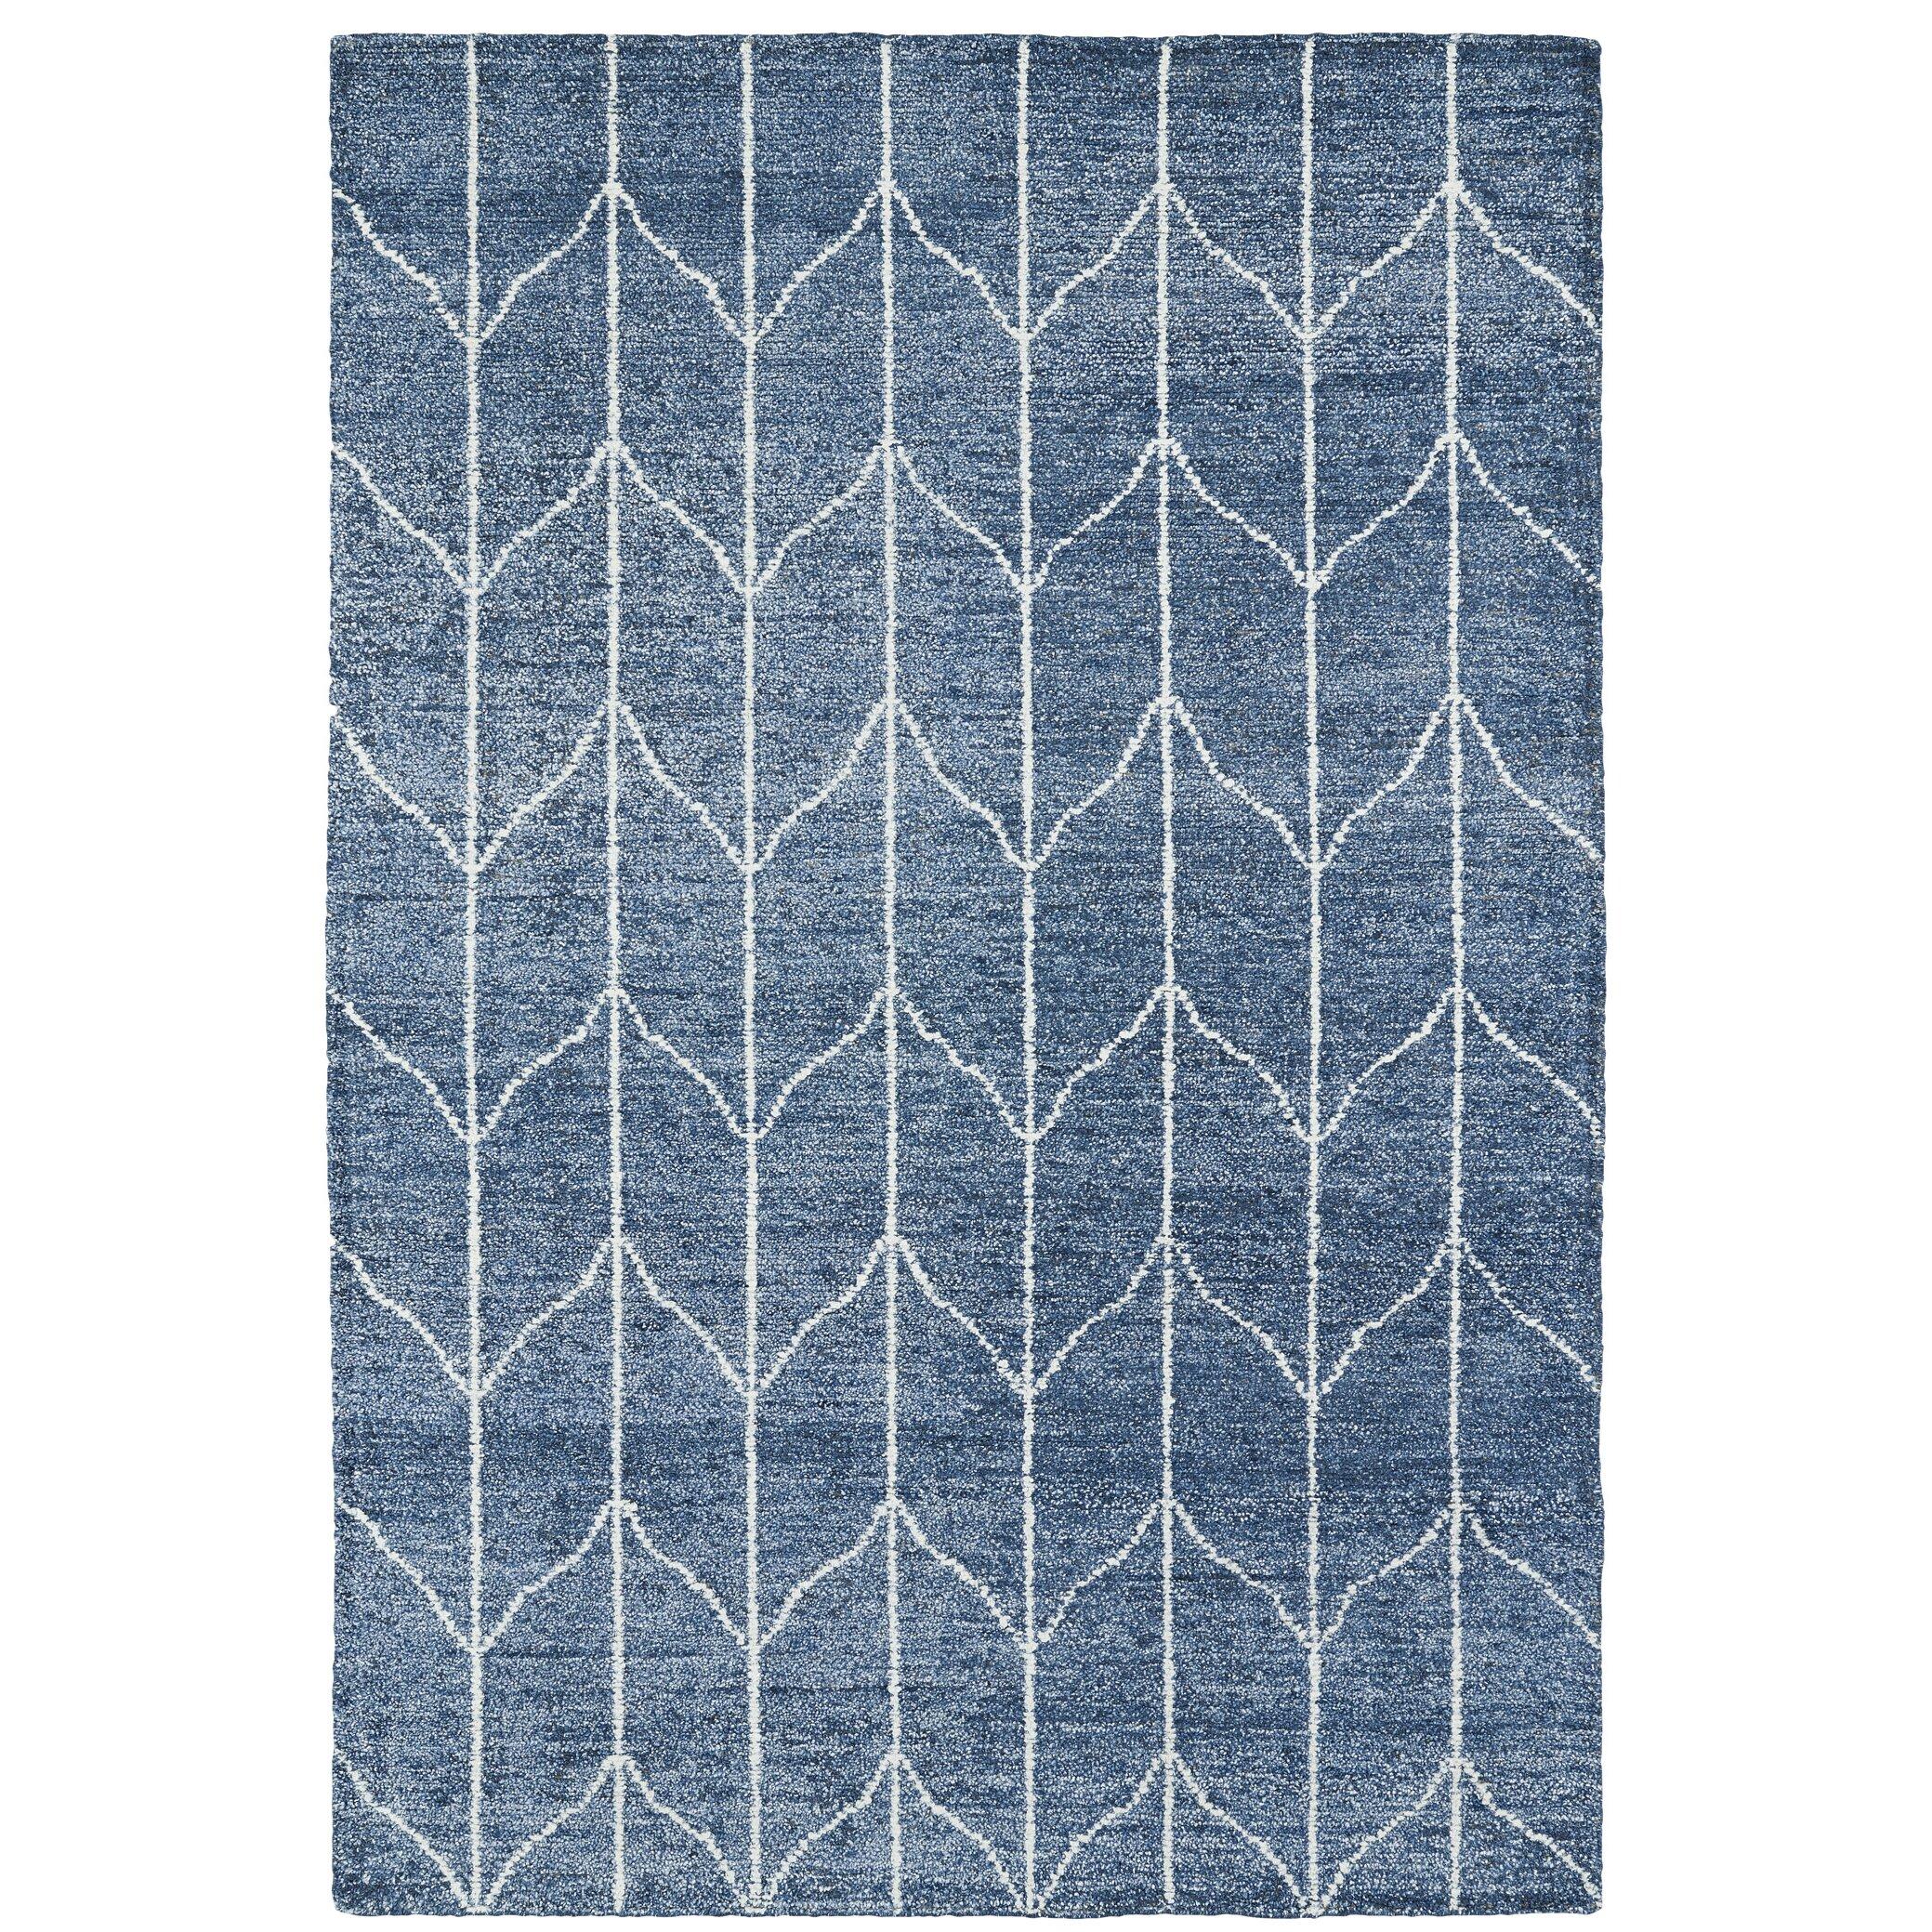 Tuscan Viga Chevron Denim Rug: Mercury Row Handmade Denim Blue / Ivory Area Rug